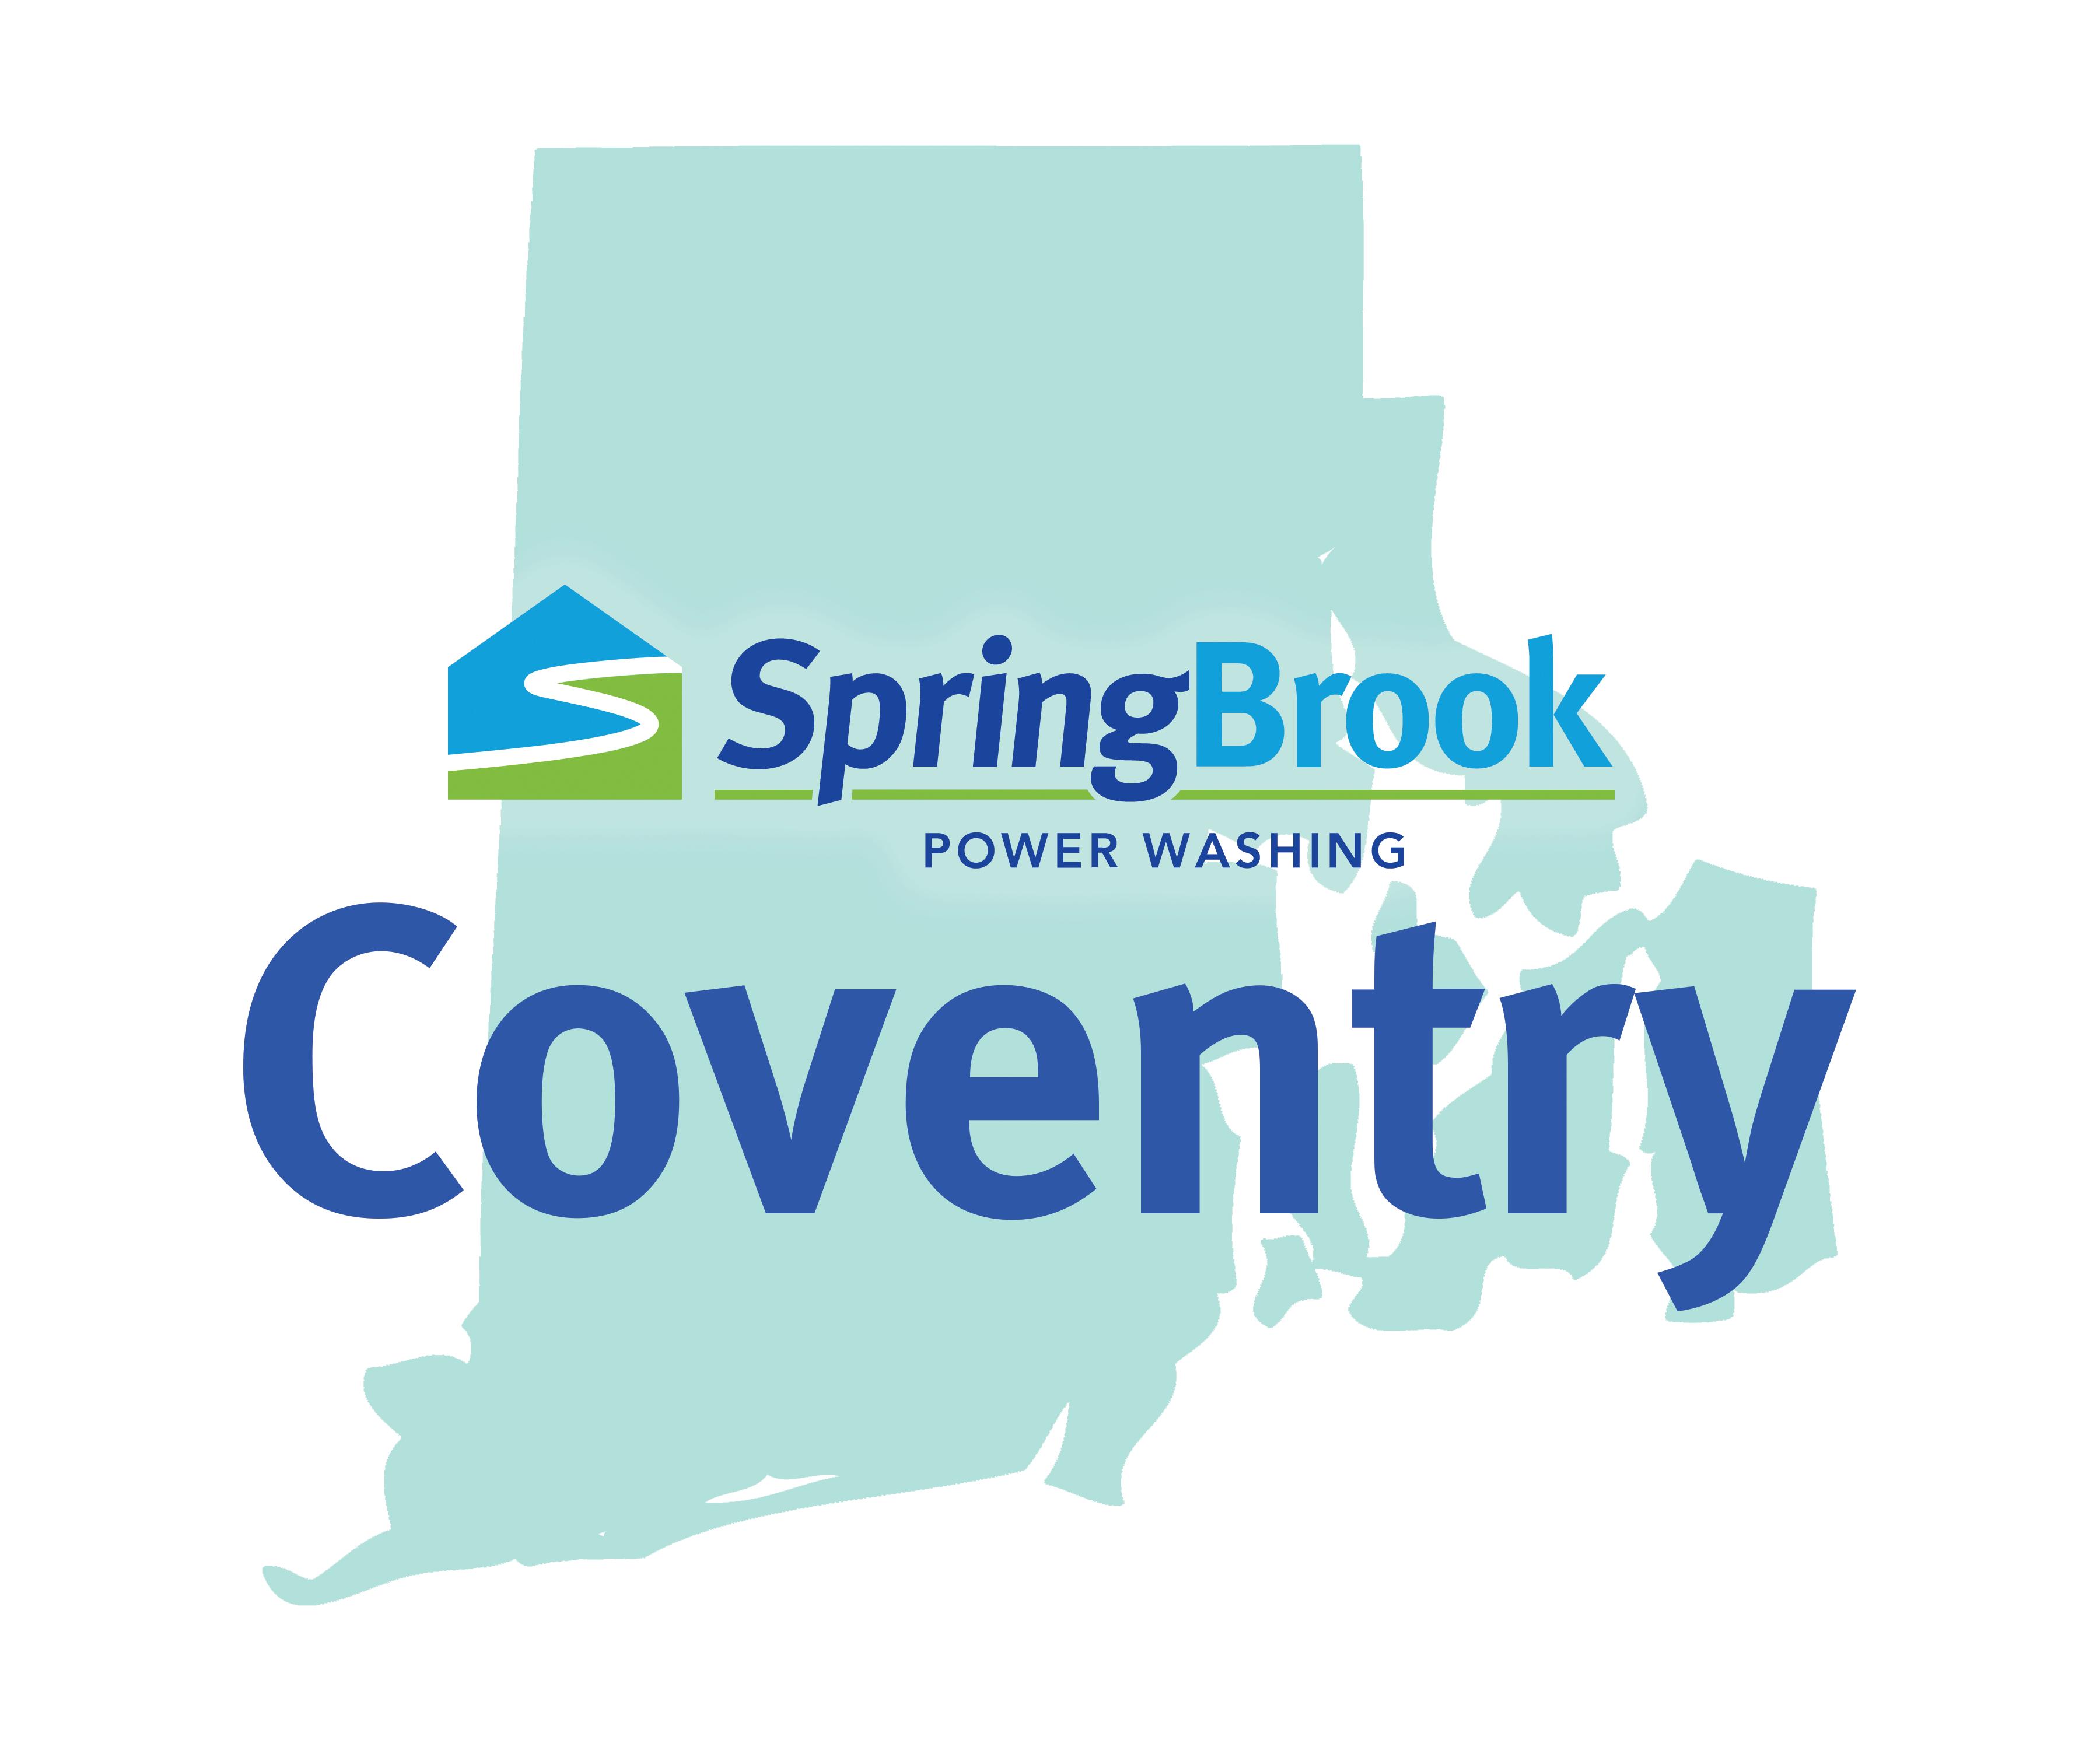 Springbrook Power Washing Coventry Rhode Island